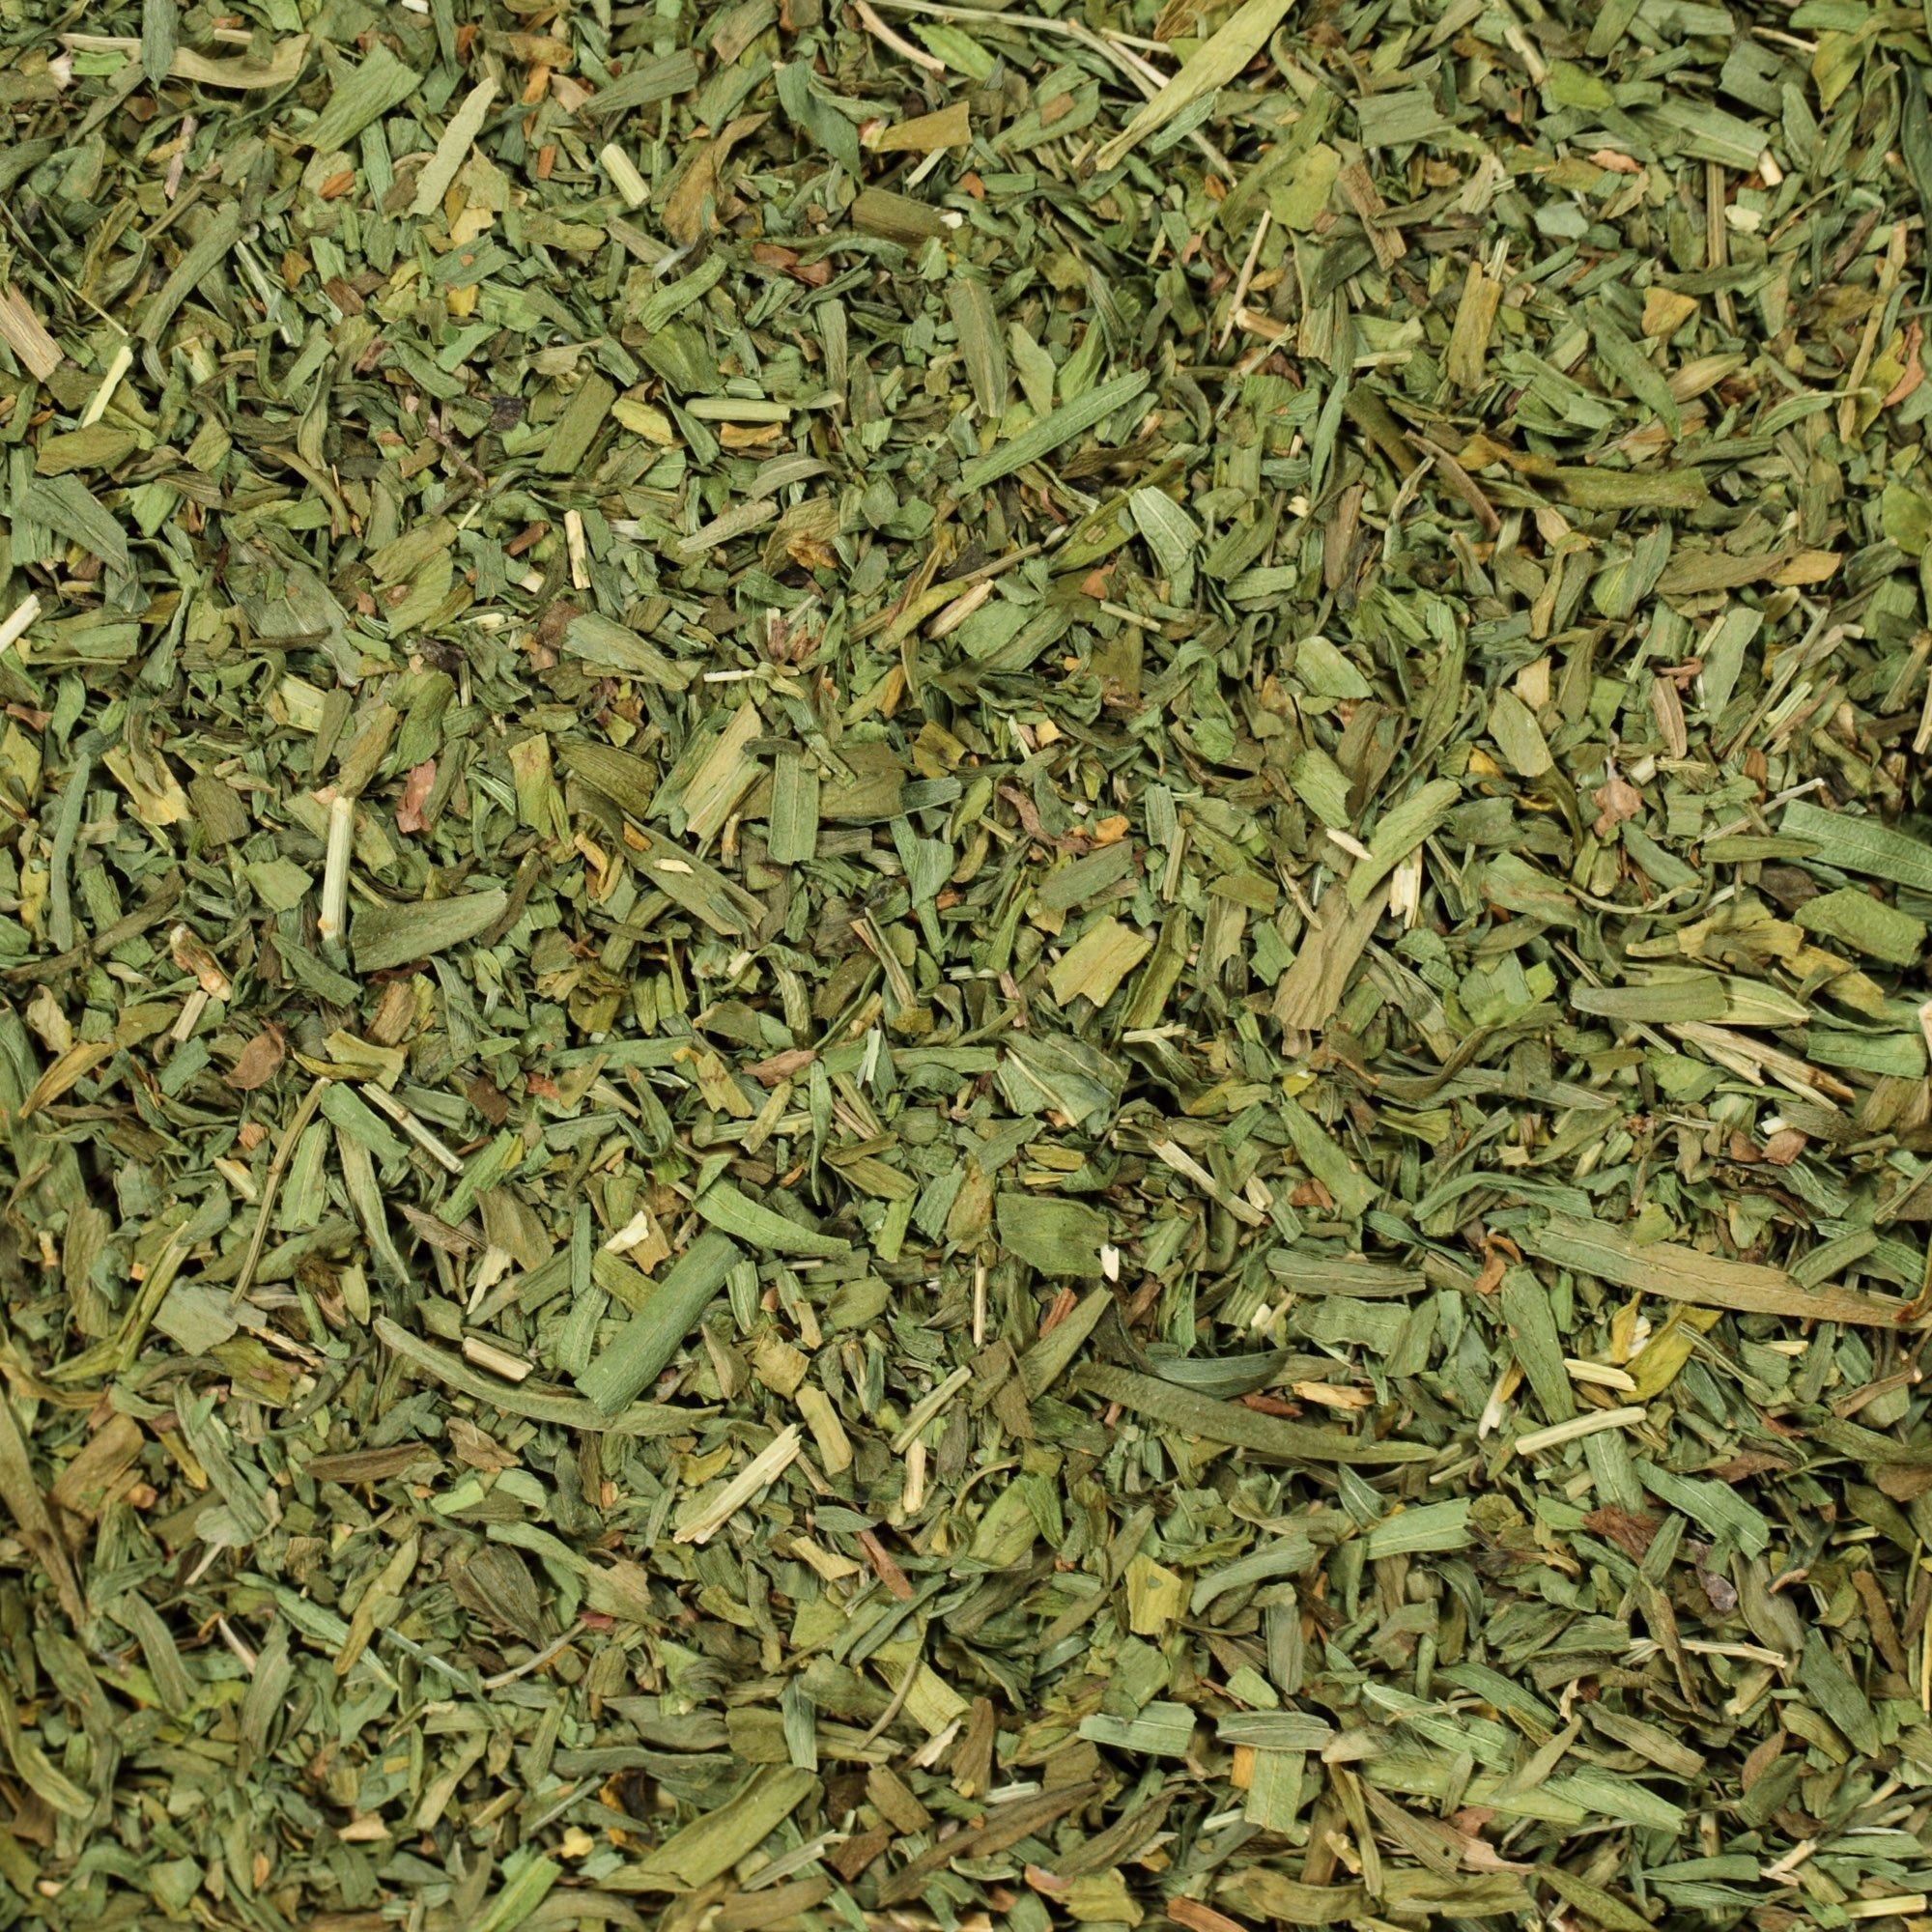 The Spice Lab No. 34 - Dried Tarragon - All Natural Kosher Non GMO Gluten Free Spice - 1 lb Resealable Bag